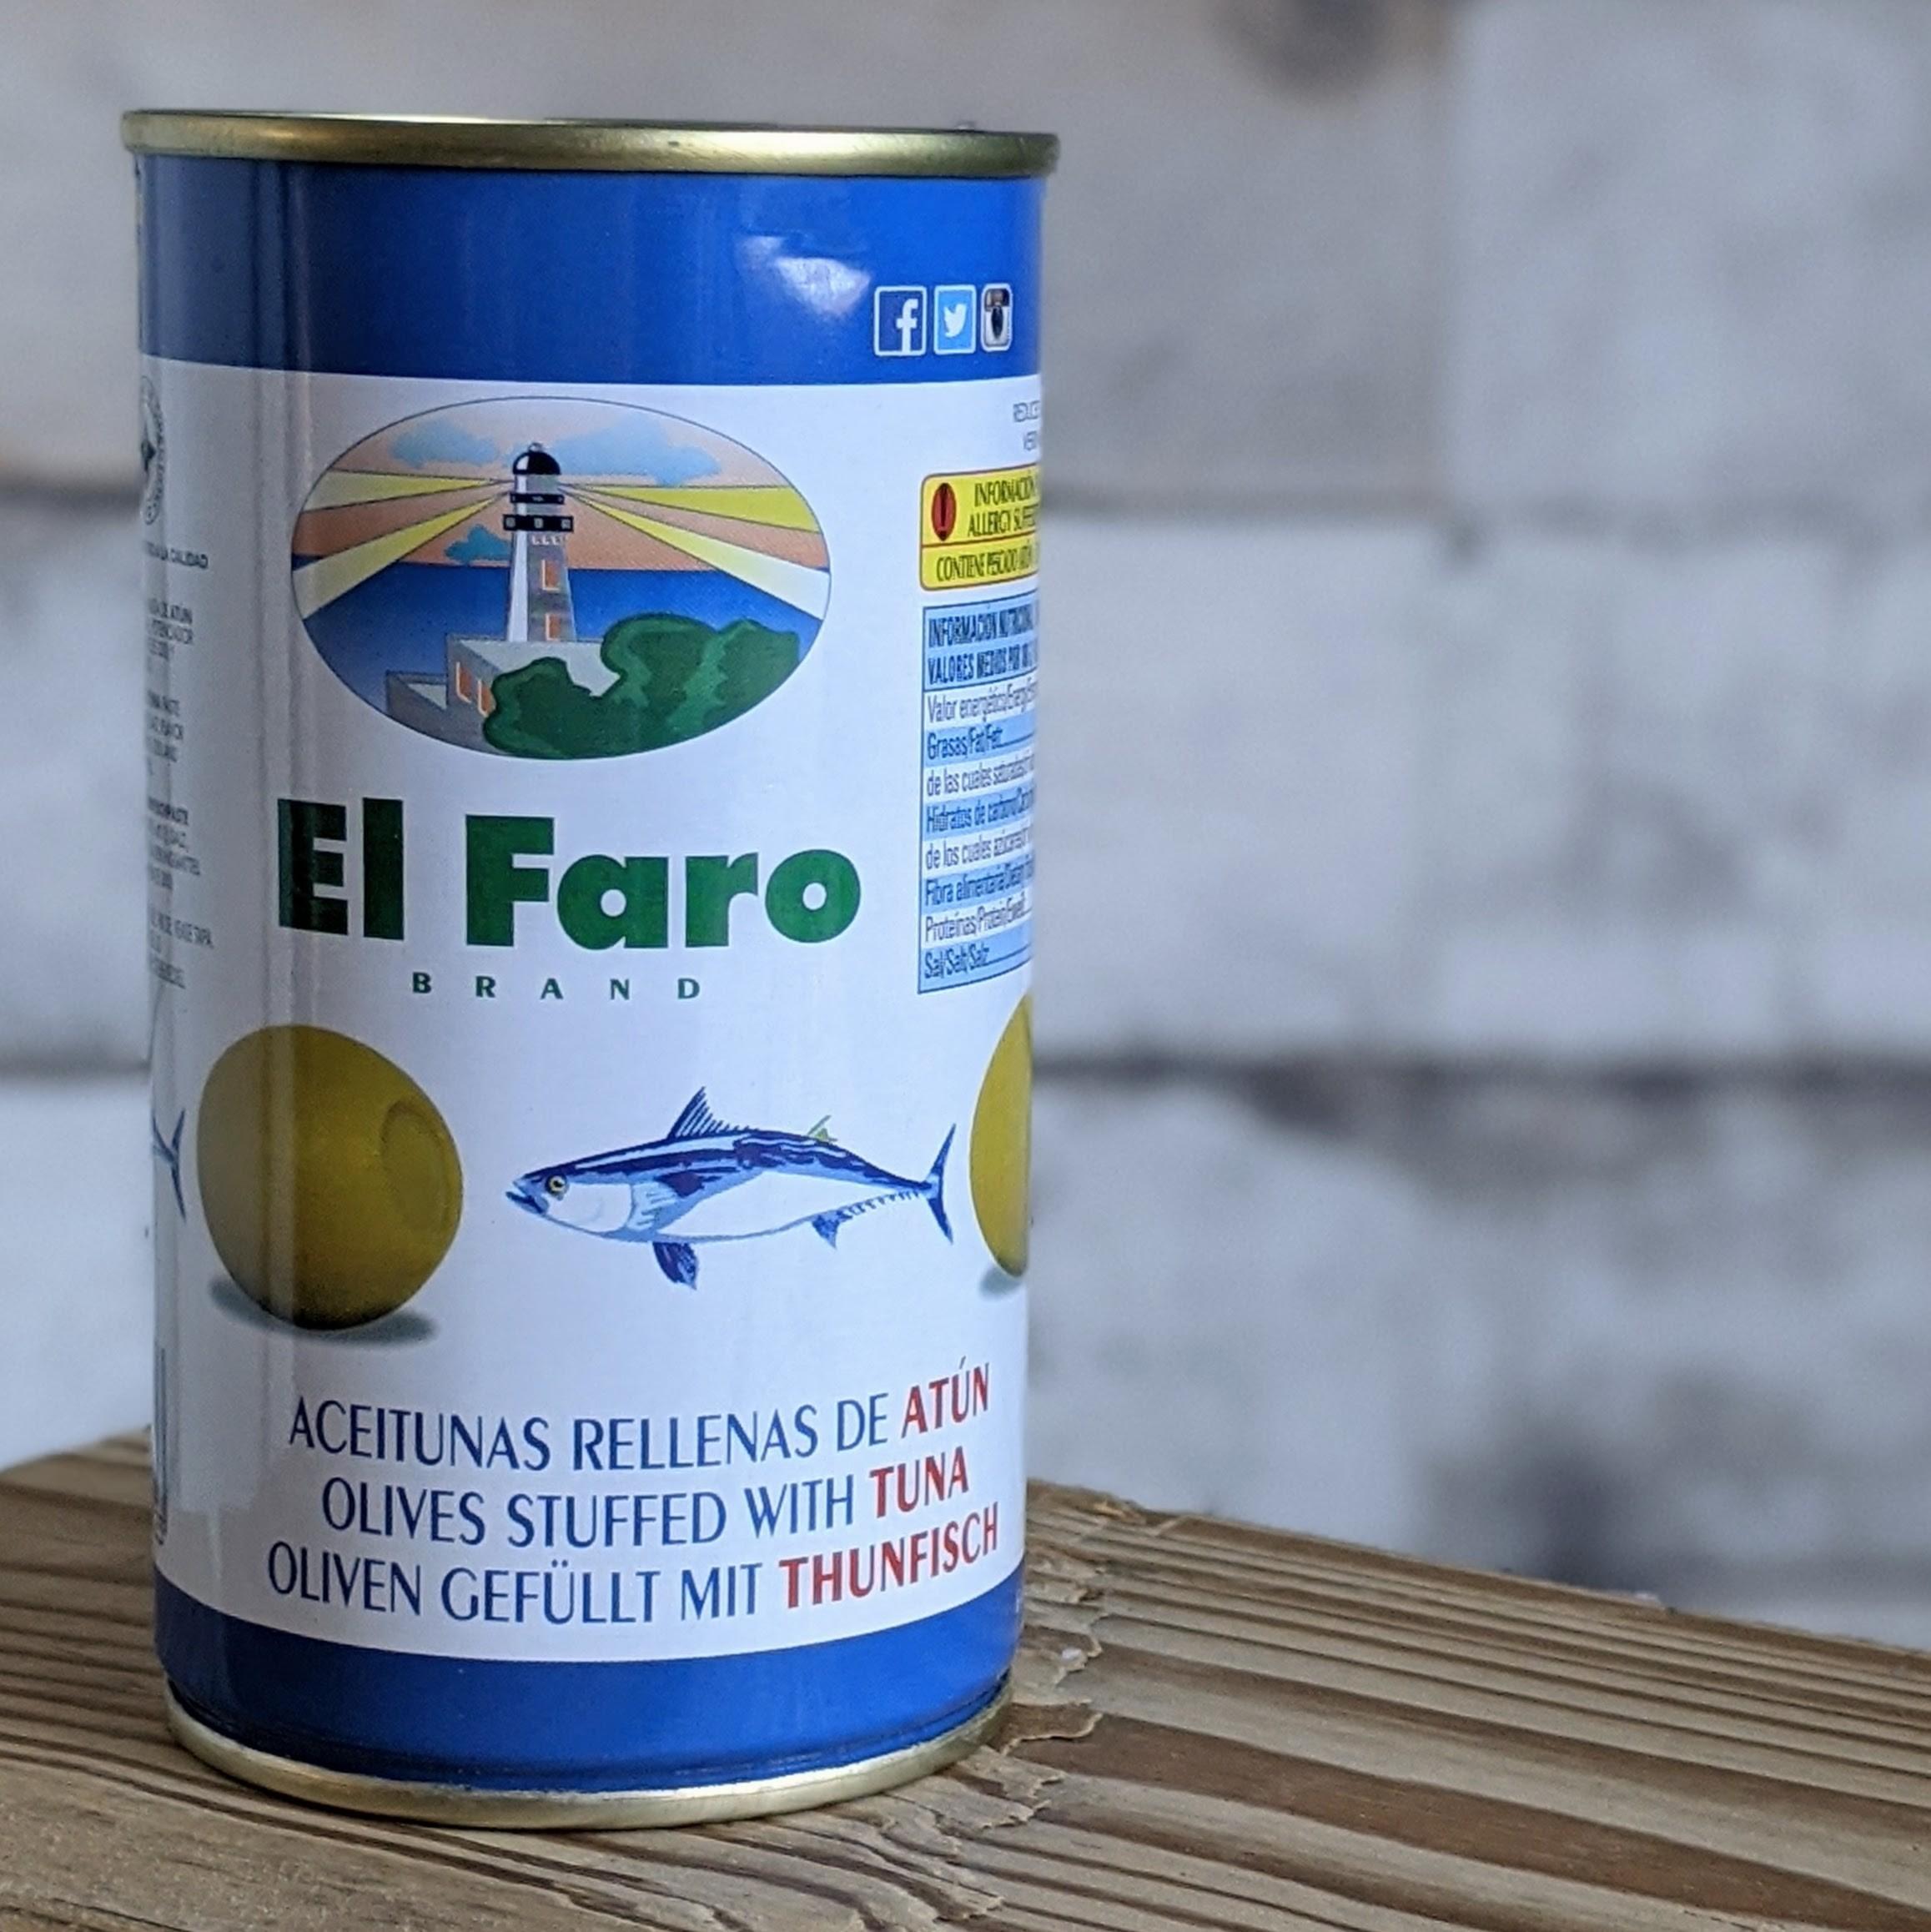 El Faro Grüne Oliven Atun, 350g